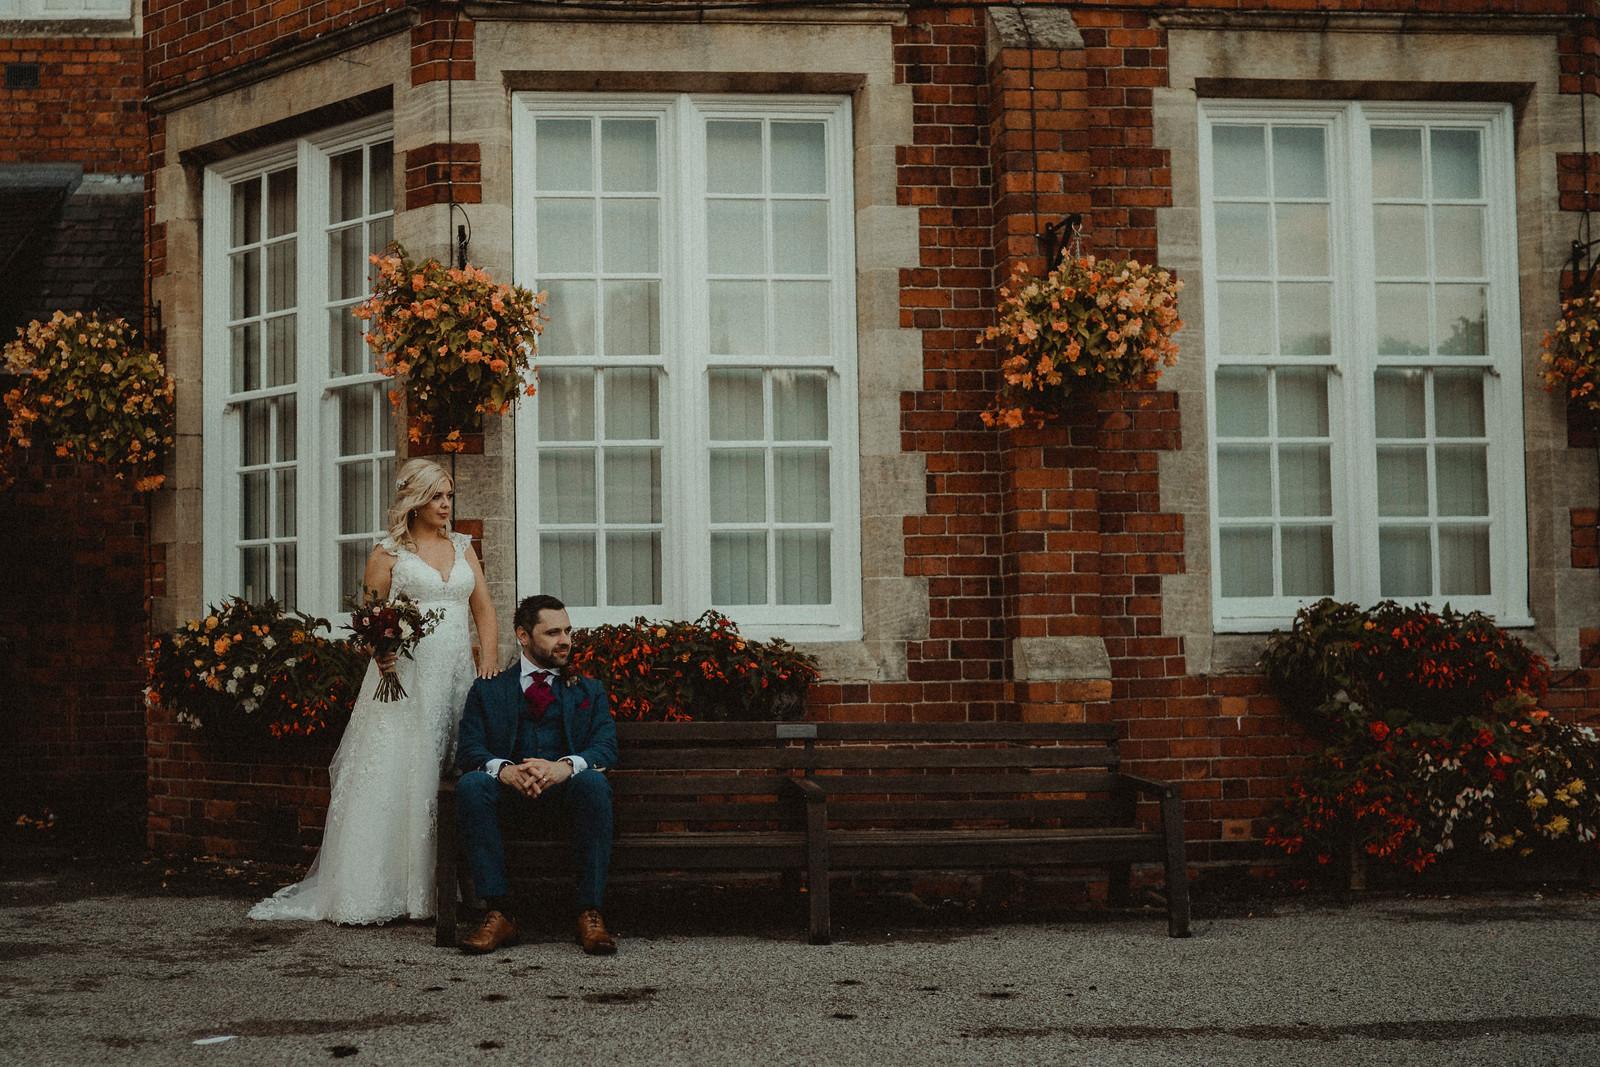 Bride and groom sat outside their wedding venue  Autumn wedding